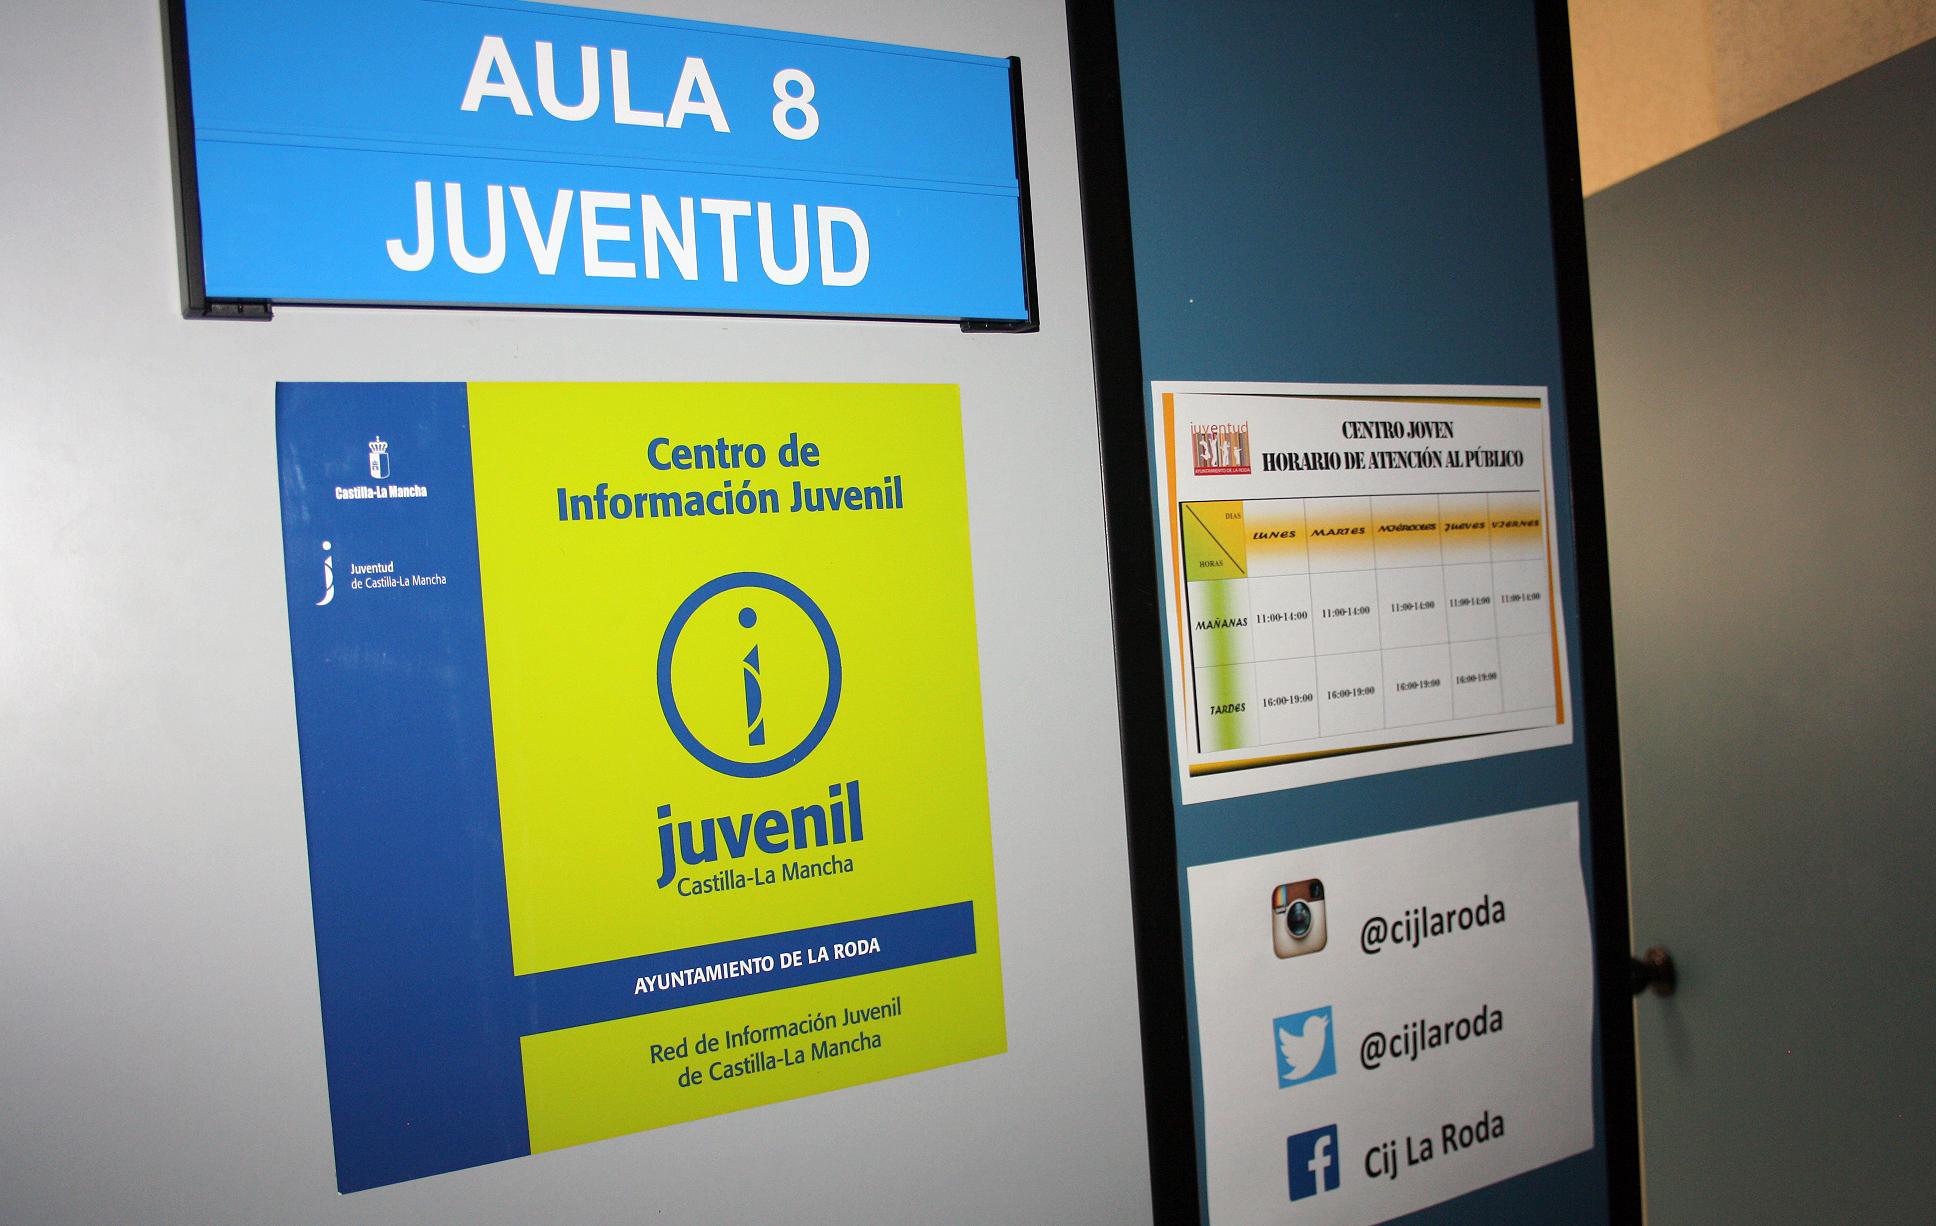 Centro Informacion Juvenil Cij